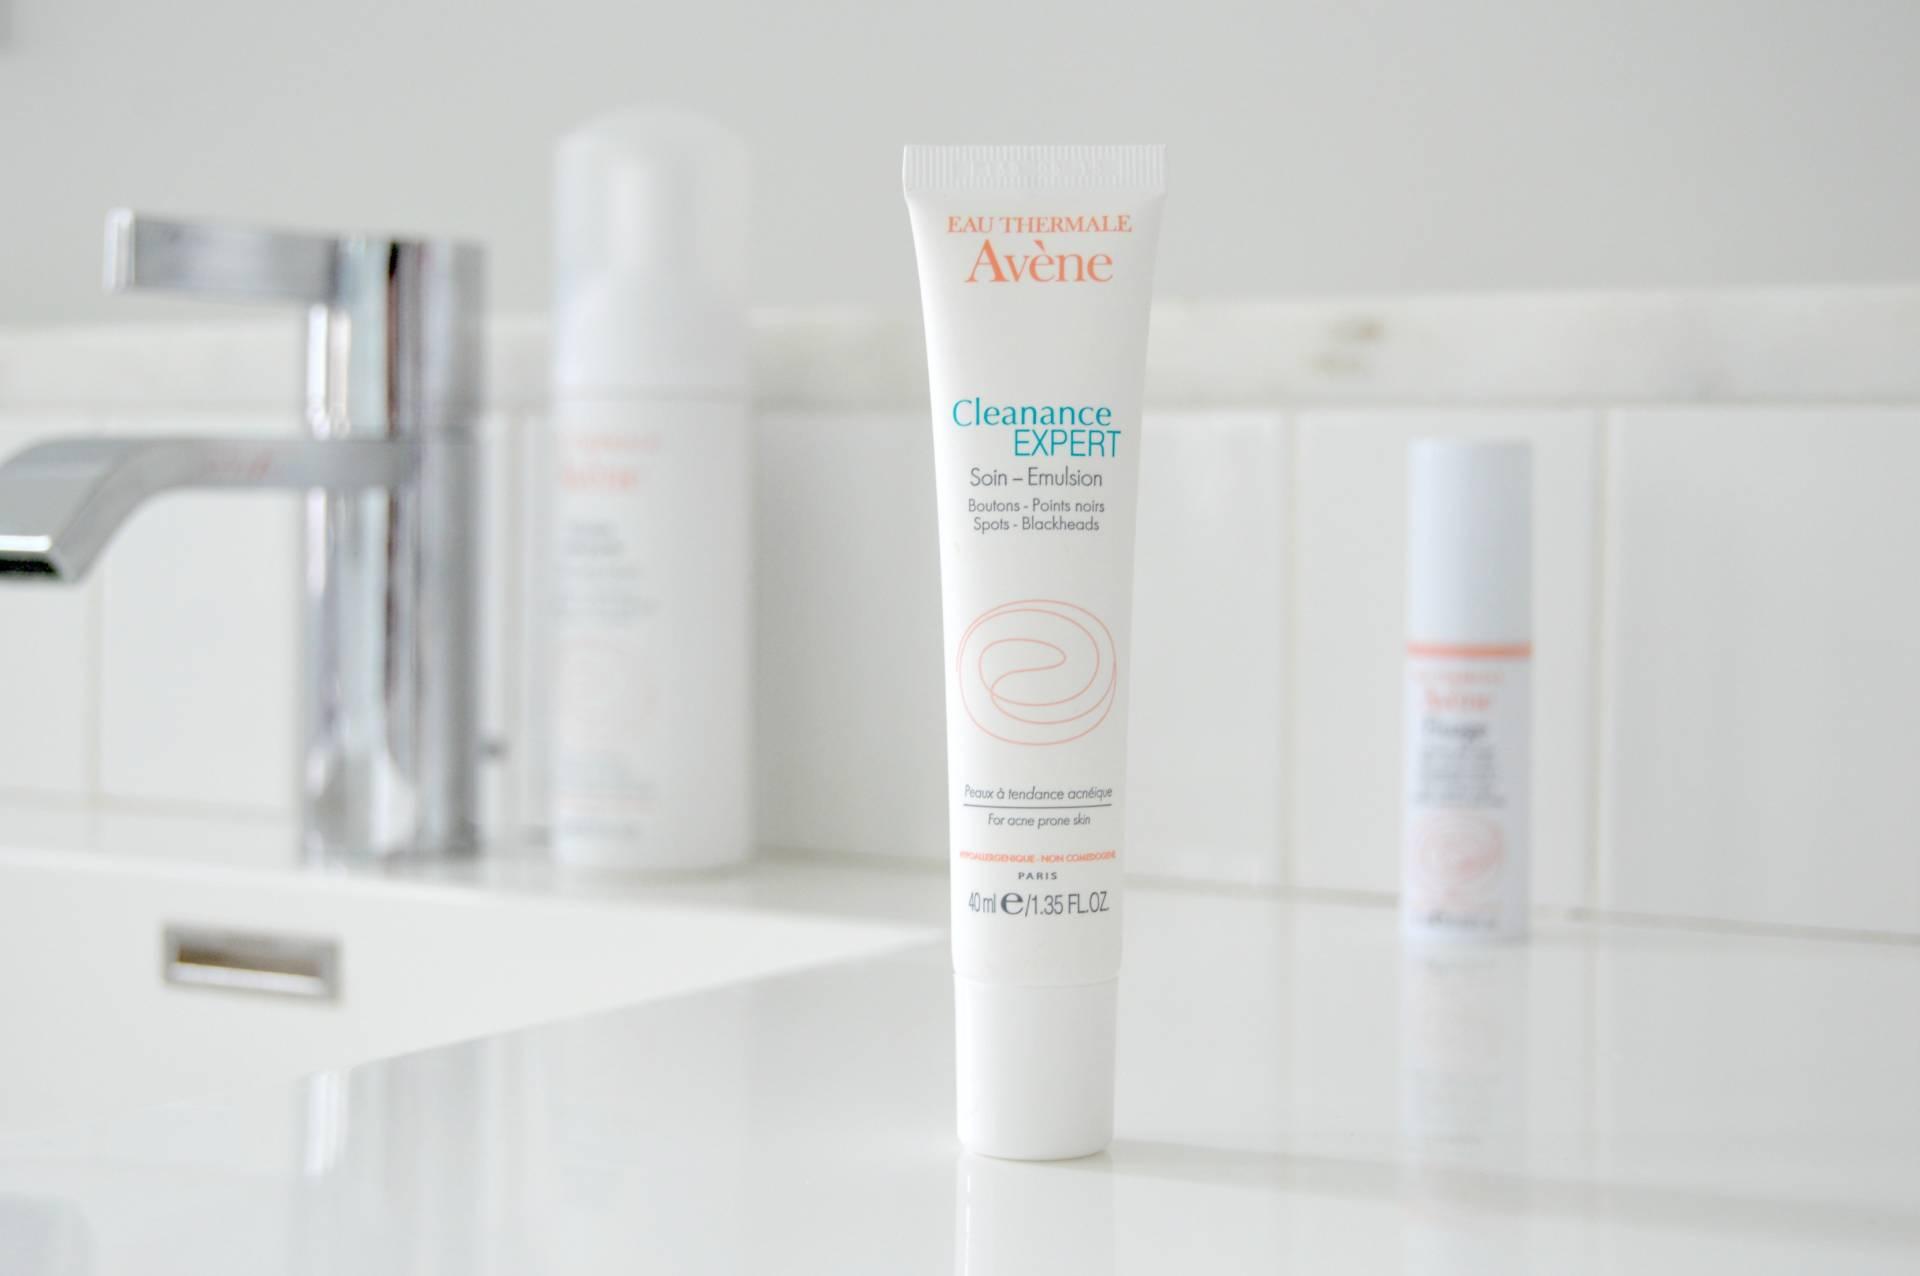 avene cleanance expert moisturizer acne review inhautepursuit